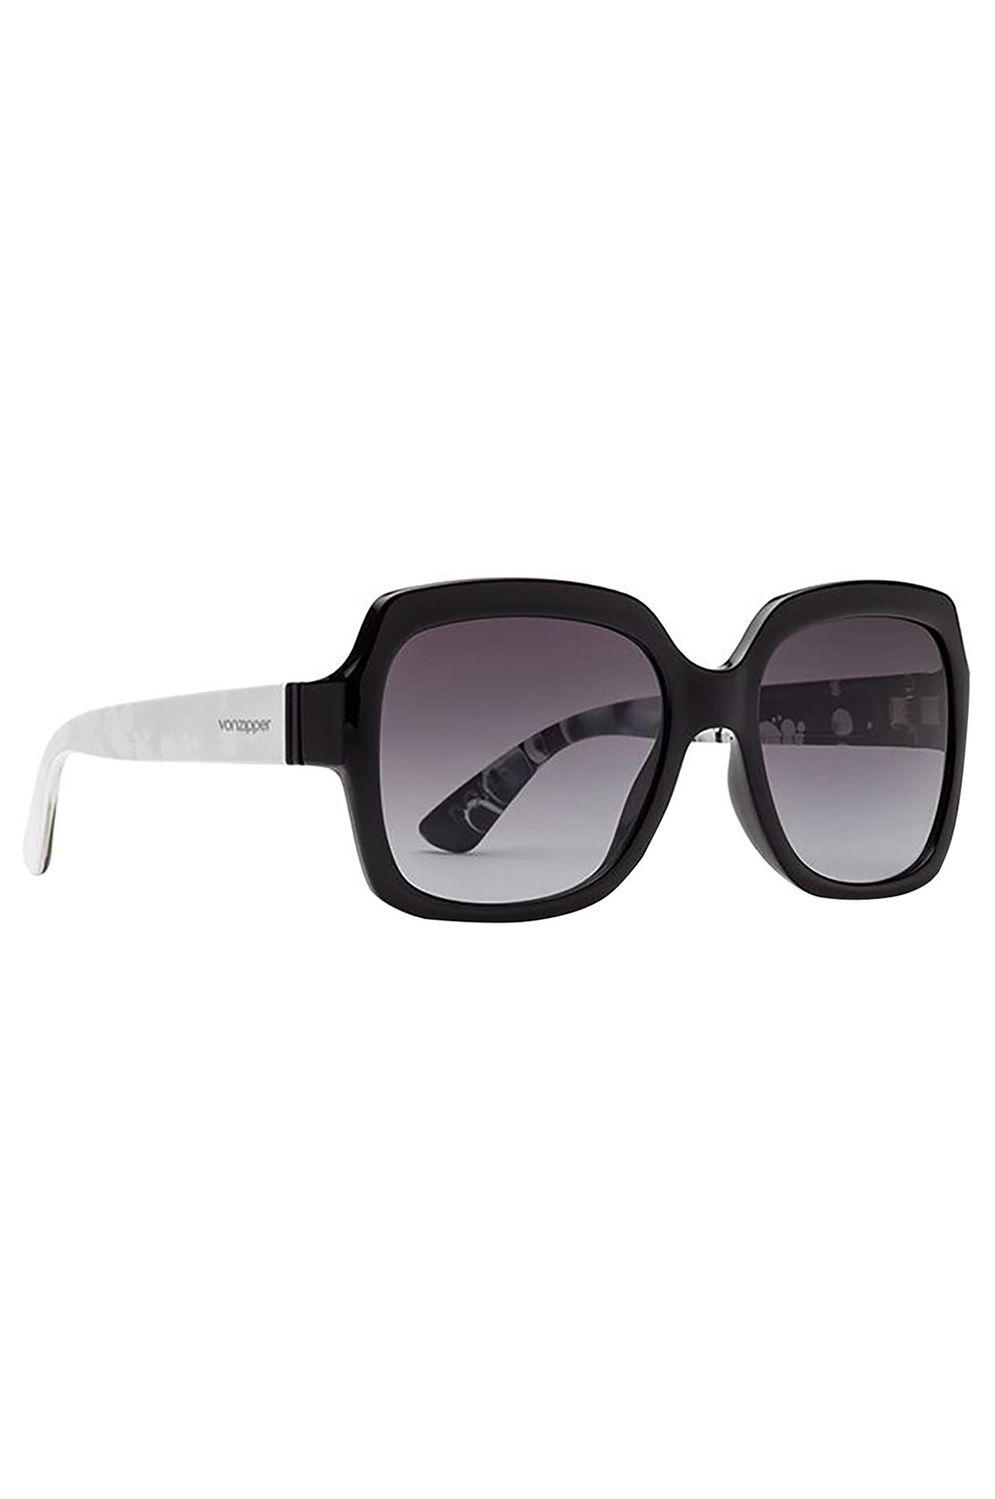 Oculos VonZipper DOLLS Liquid Light Black Satin / Black Gradient